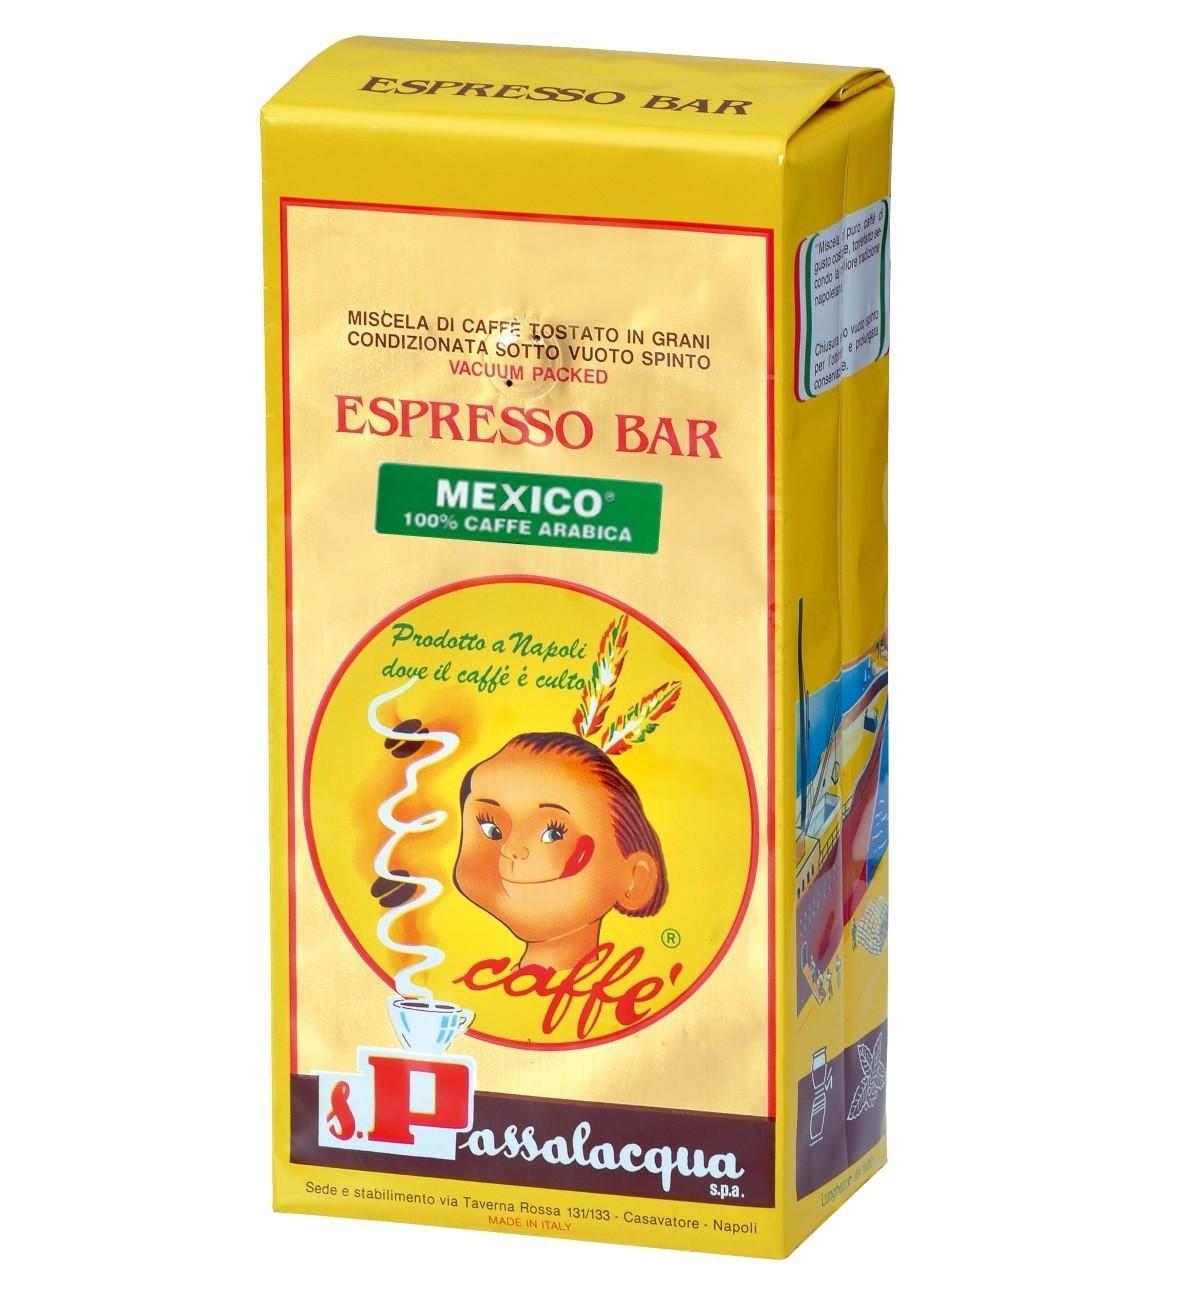 Passalacqua Mexico, Bohnen